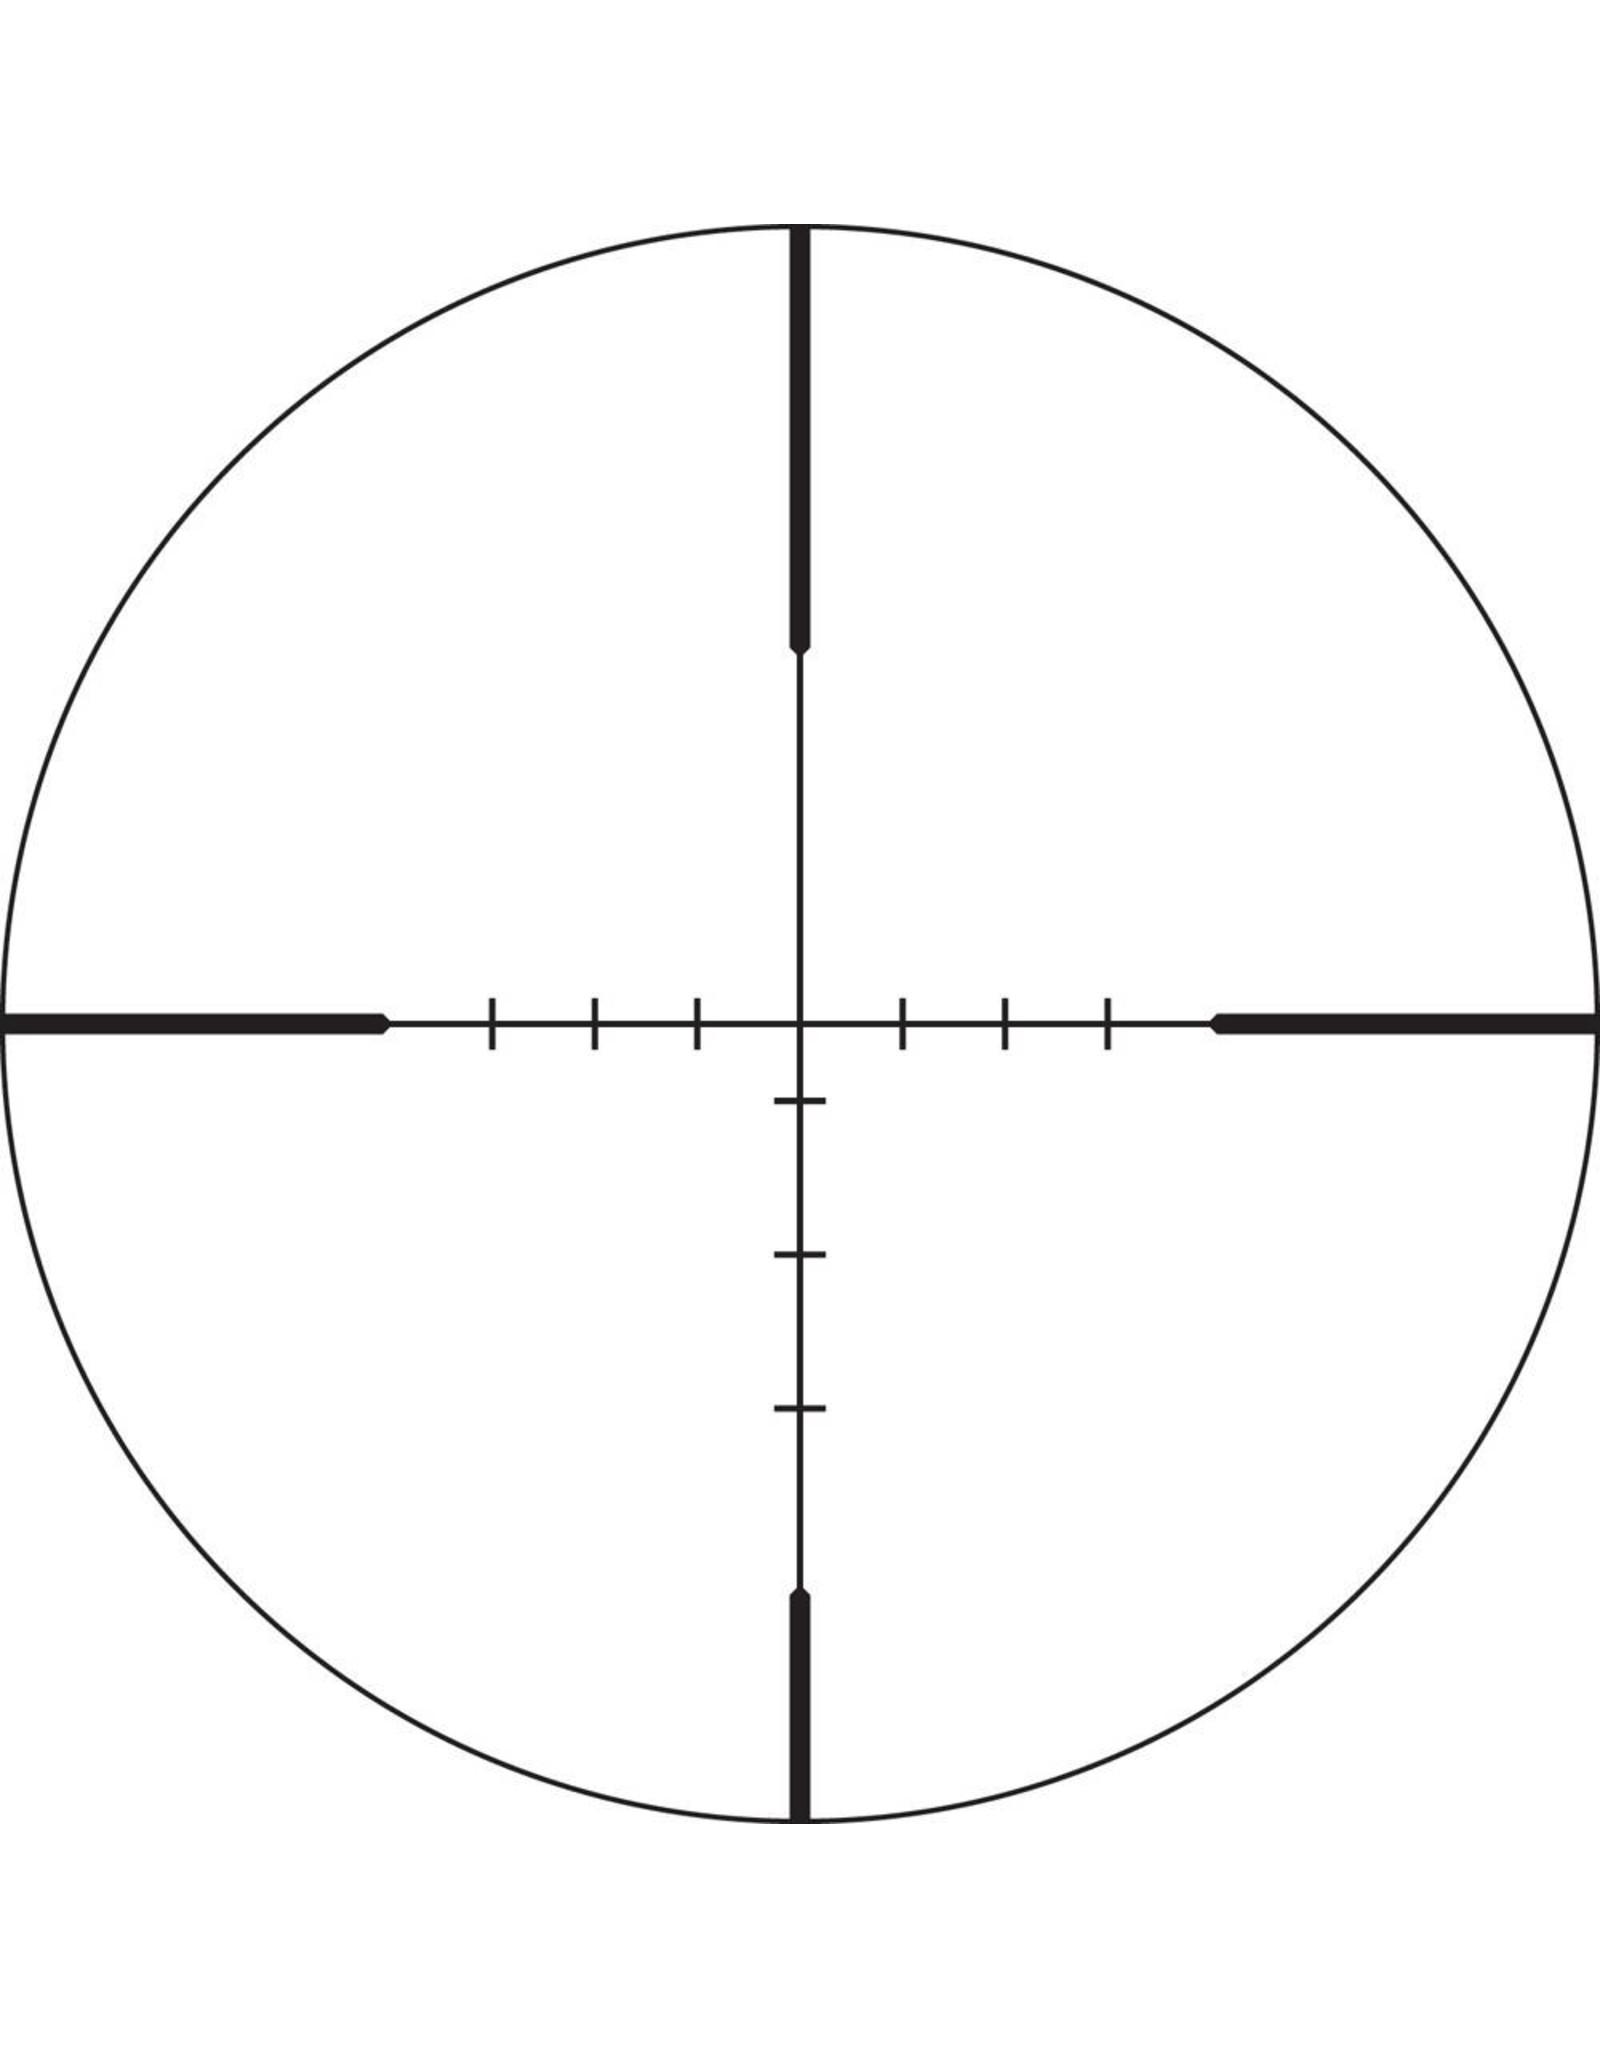 Vortex Vortex Crossfire II 6-18x44 AO Riflescope (1-Inch) BDC